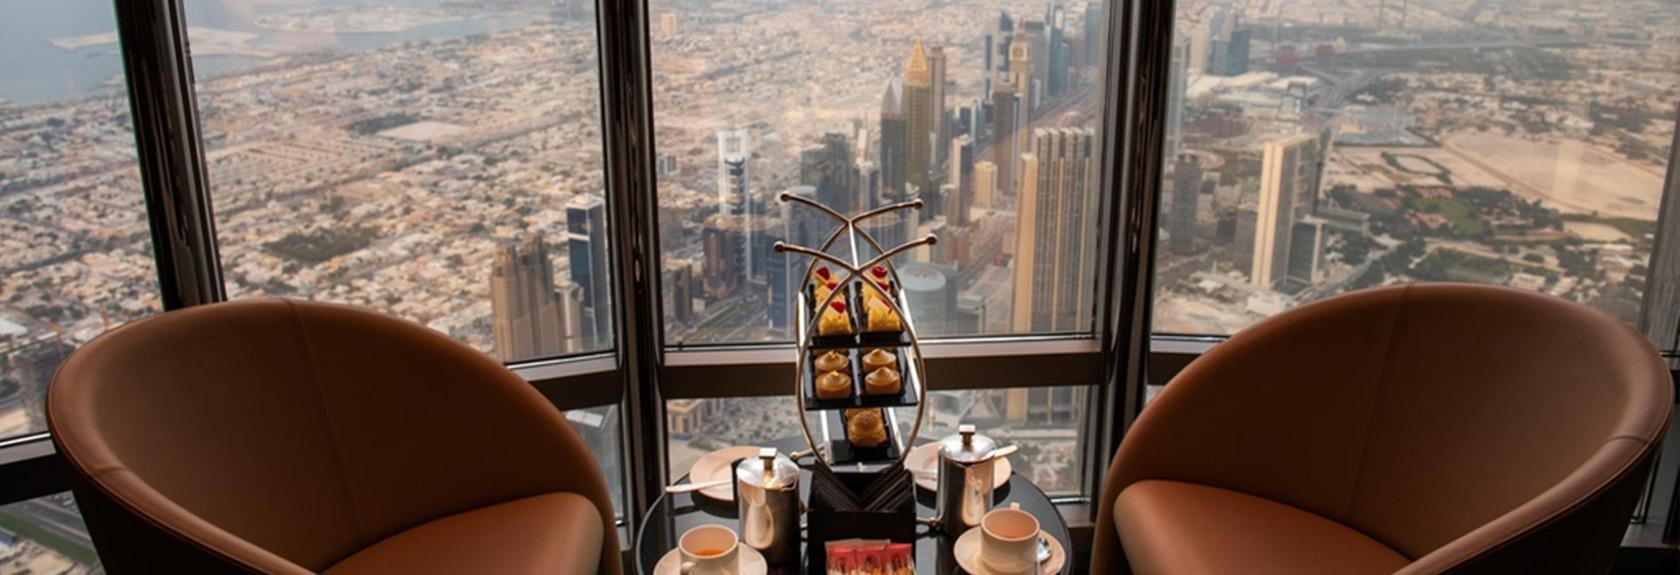 The Lounge Burj Khalifa – de hoogste lounge van de wereld